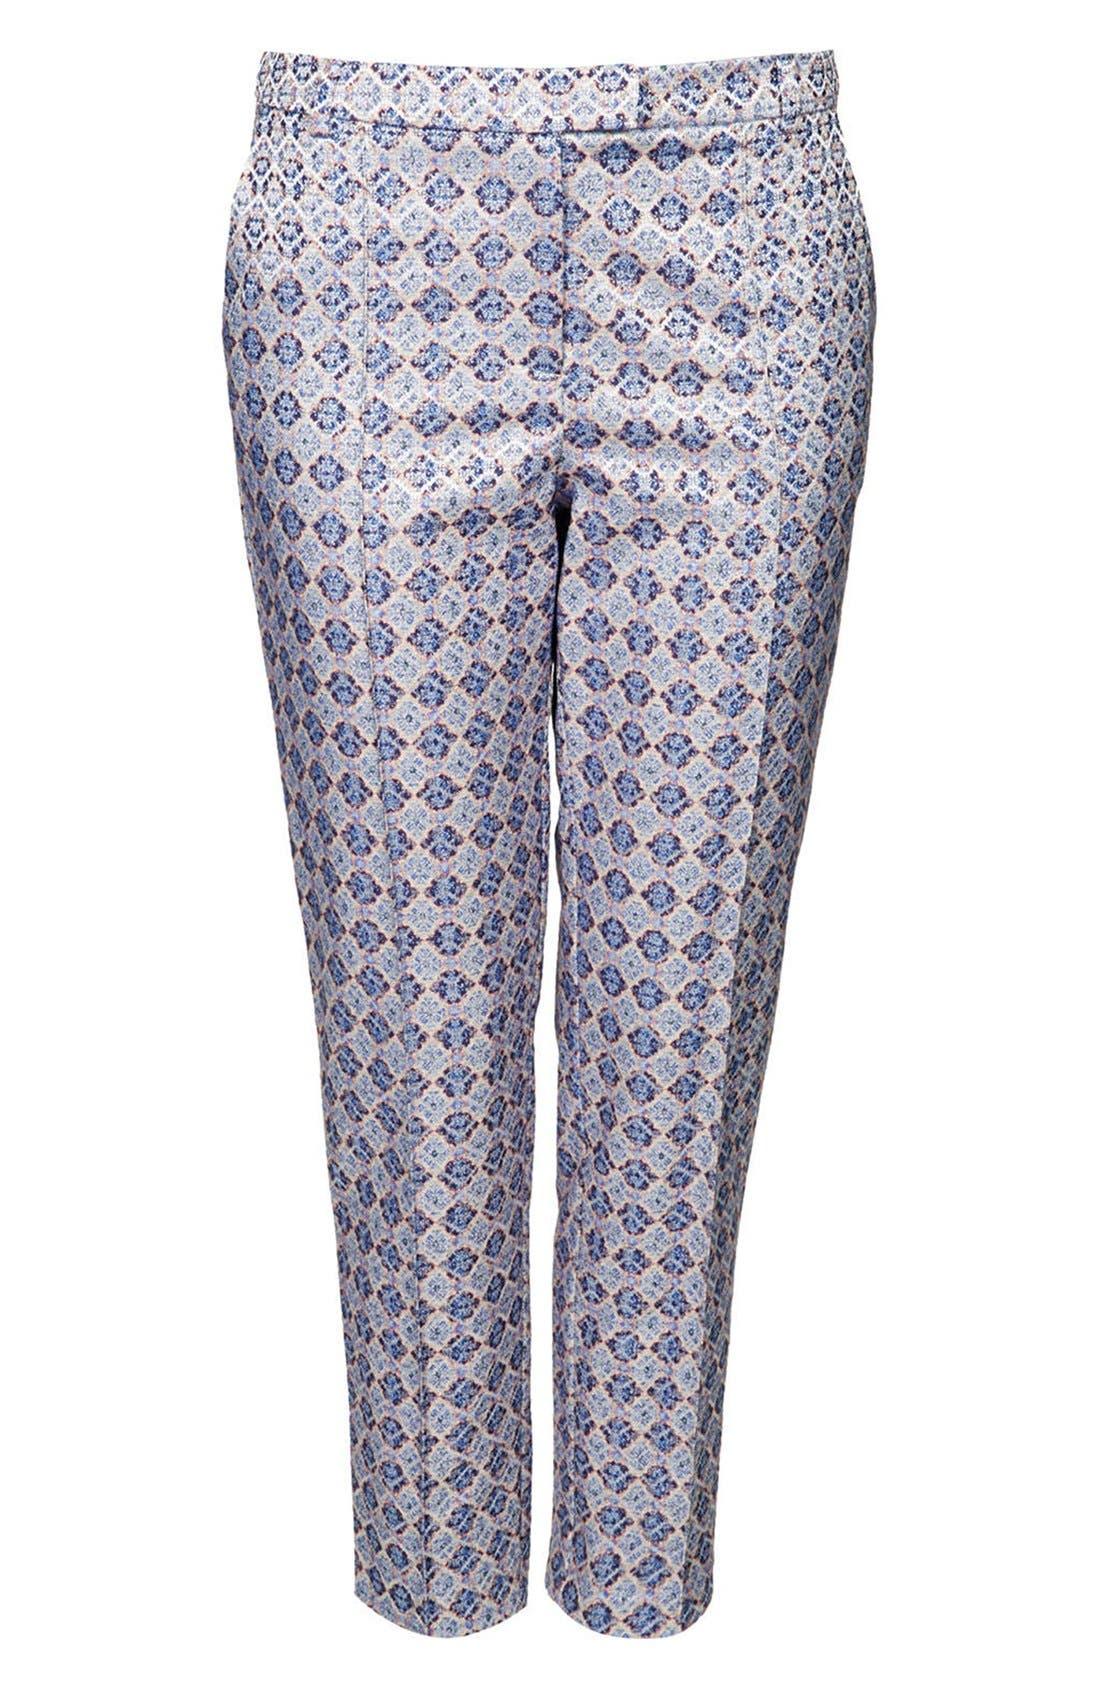 Alternate Image 3  - Topshop 'Folk Tile' Crop Jacquard Trousers